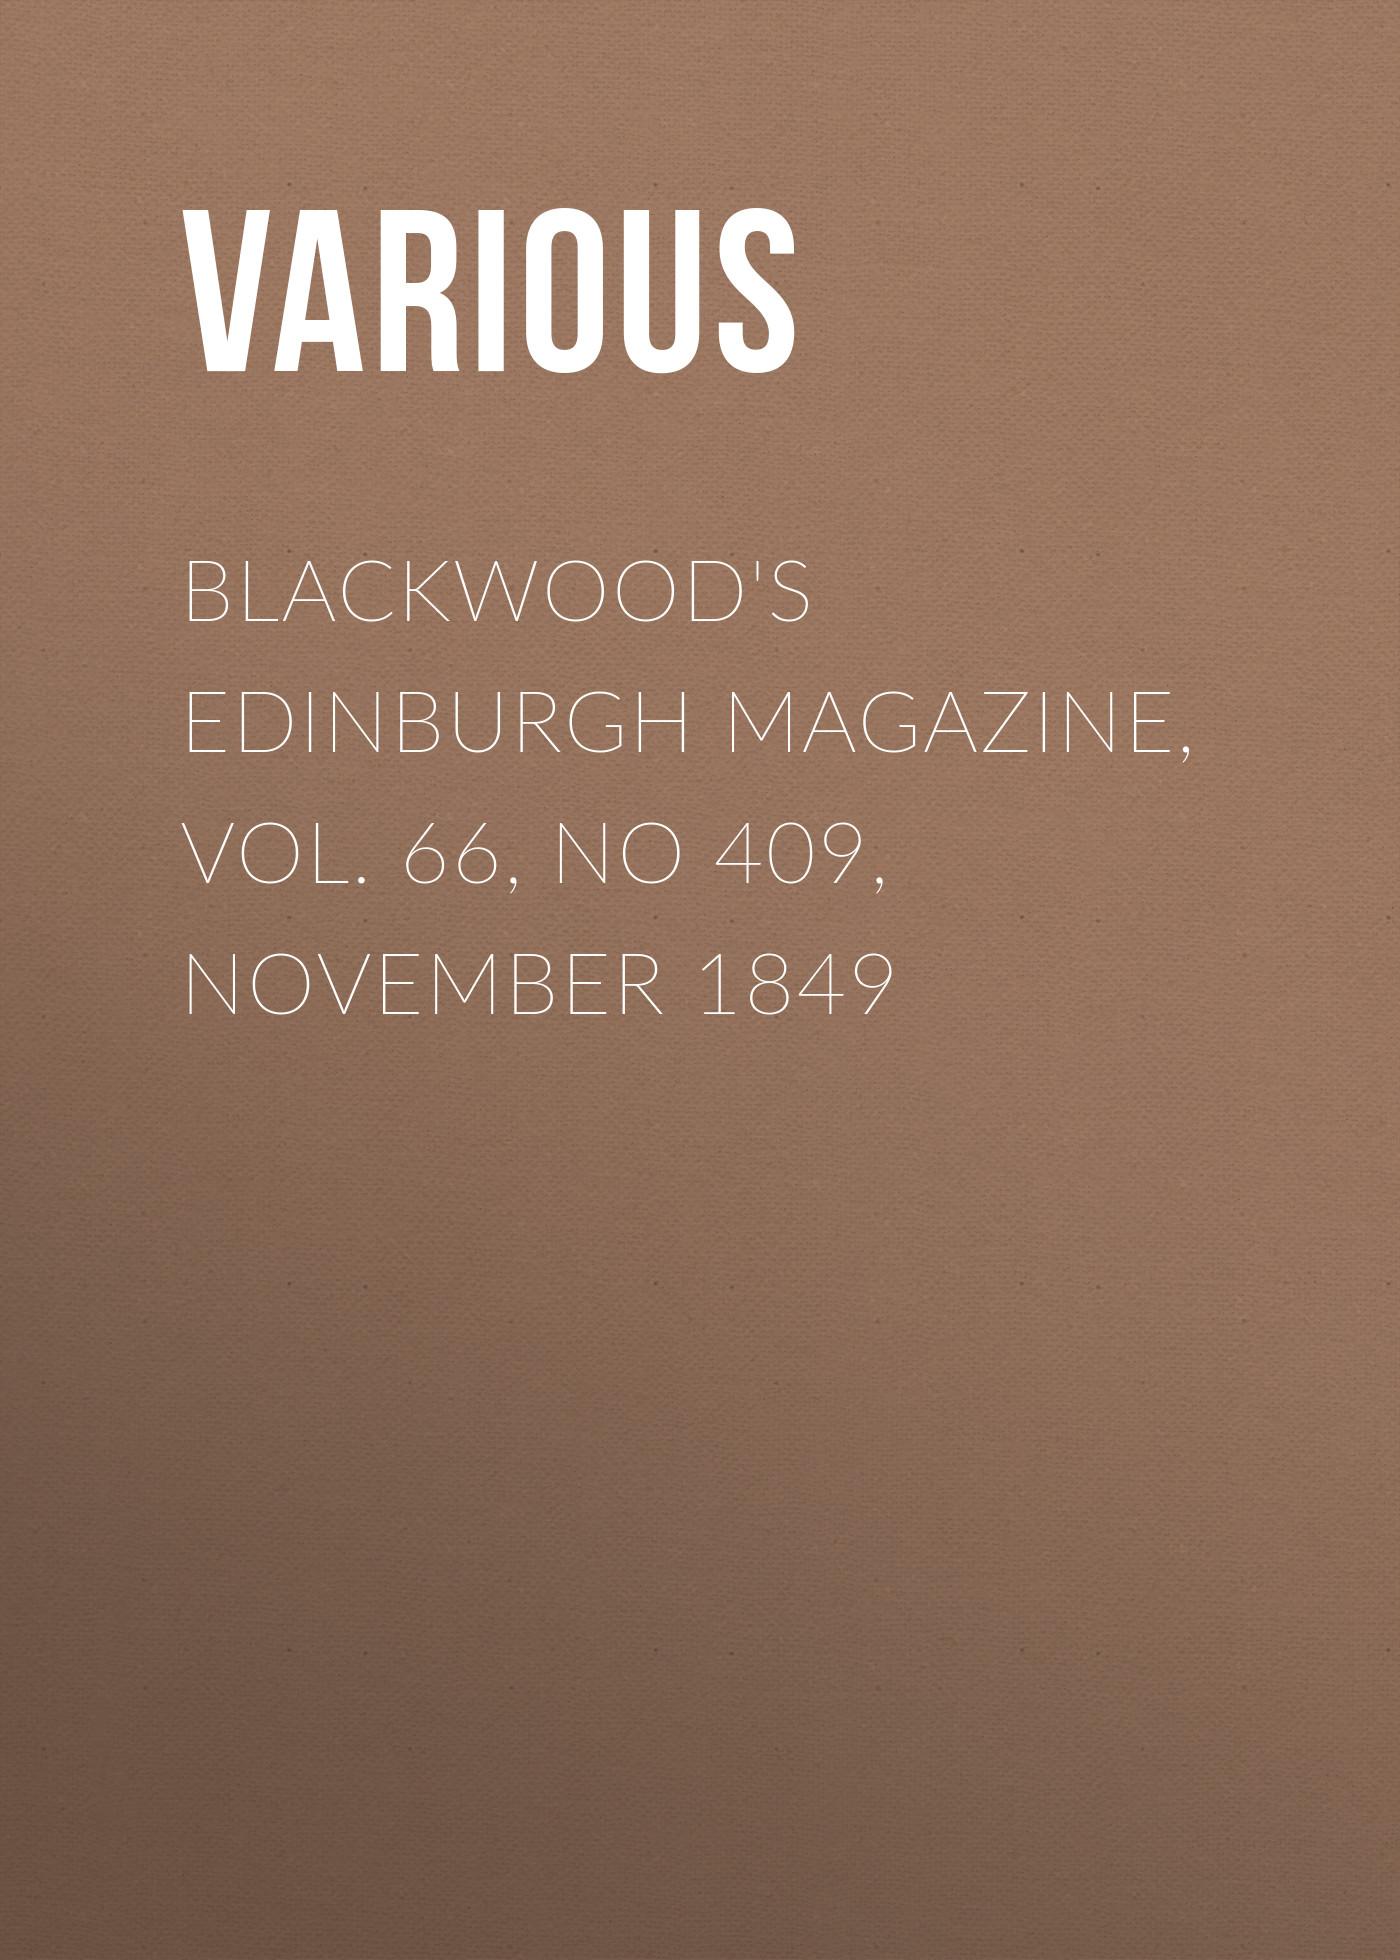 Various Blackwood's Edinburgh Magazine, Vol. 66, No 409, November 1849 цена